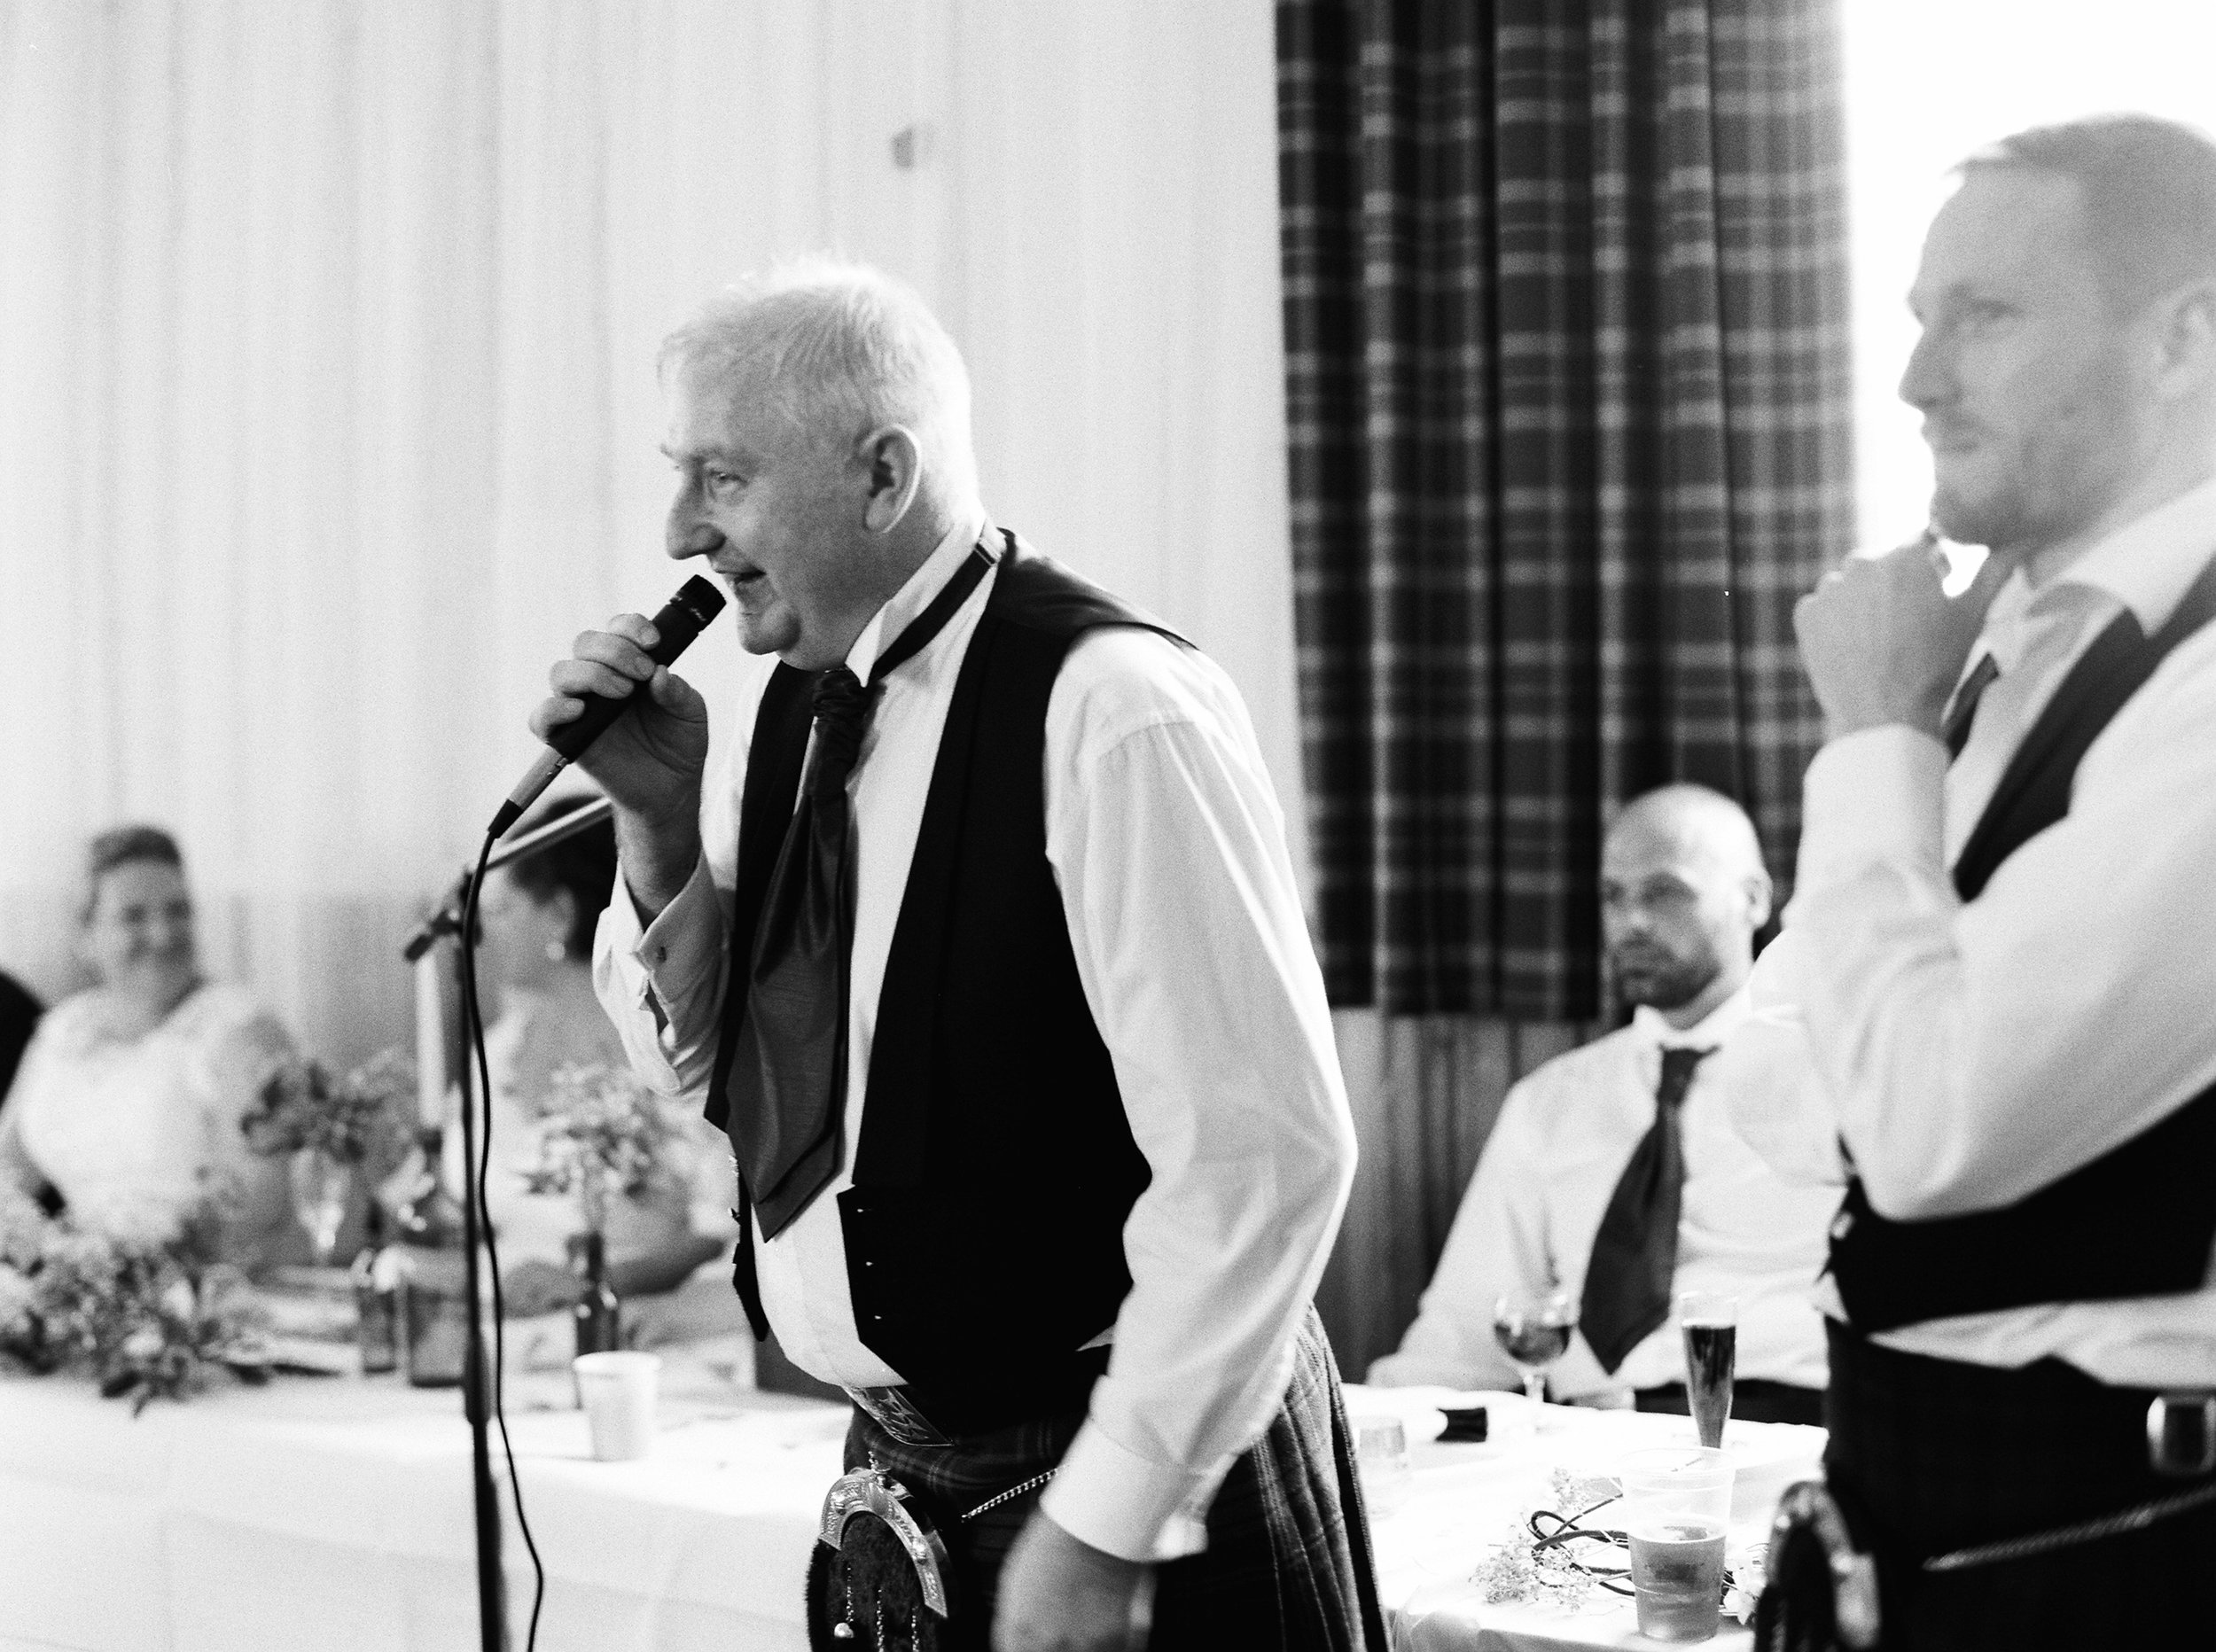 wedding-photography-scotland202.jpg